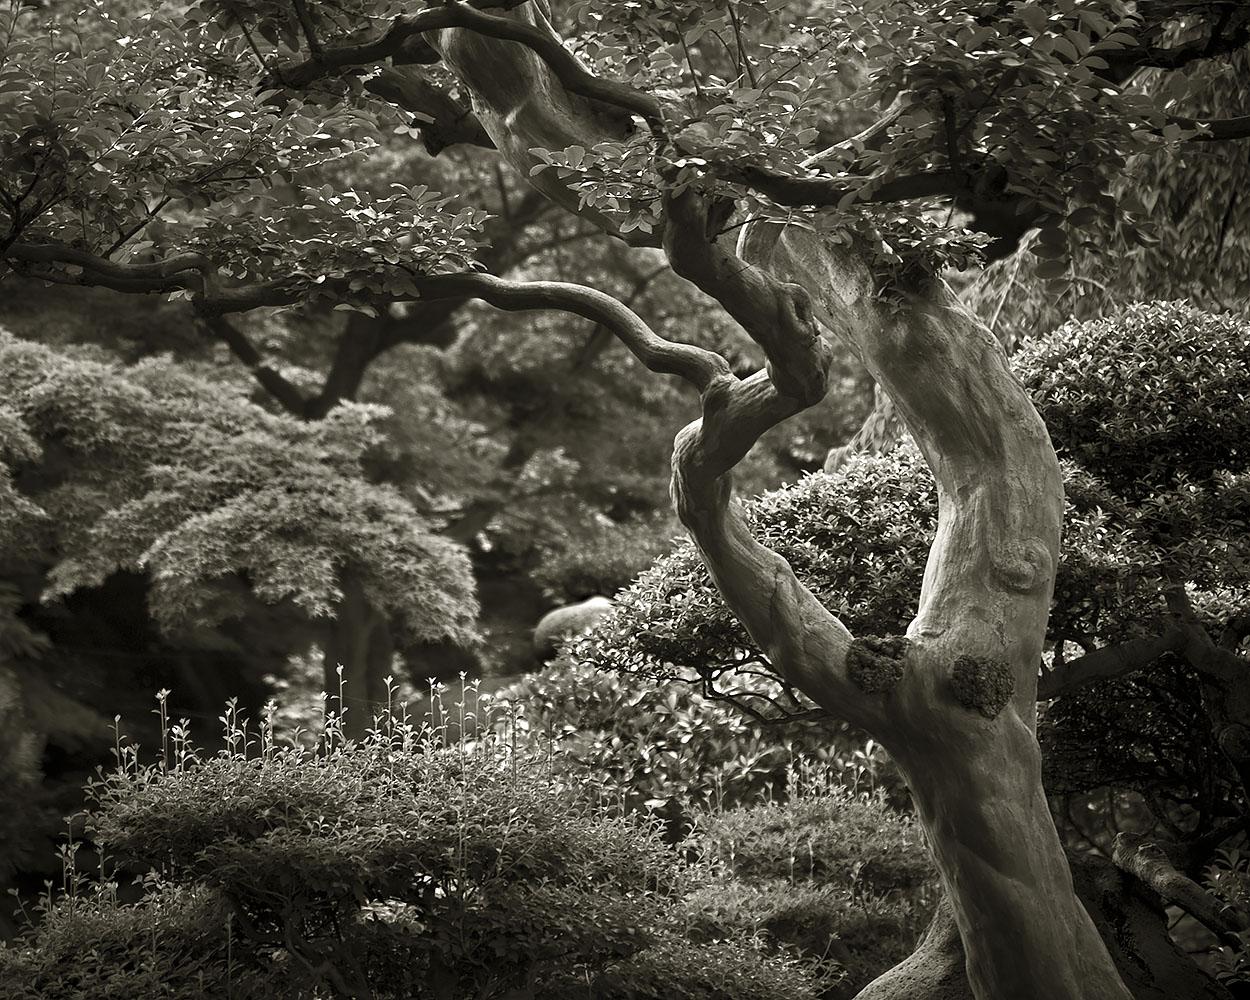 Japanese Garden Project #6